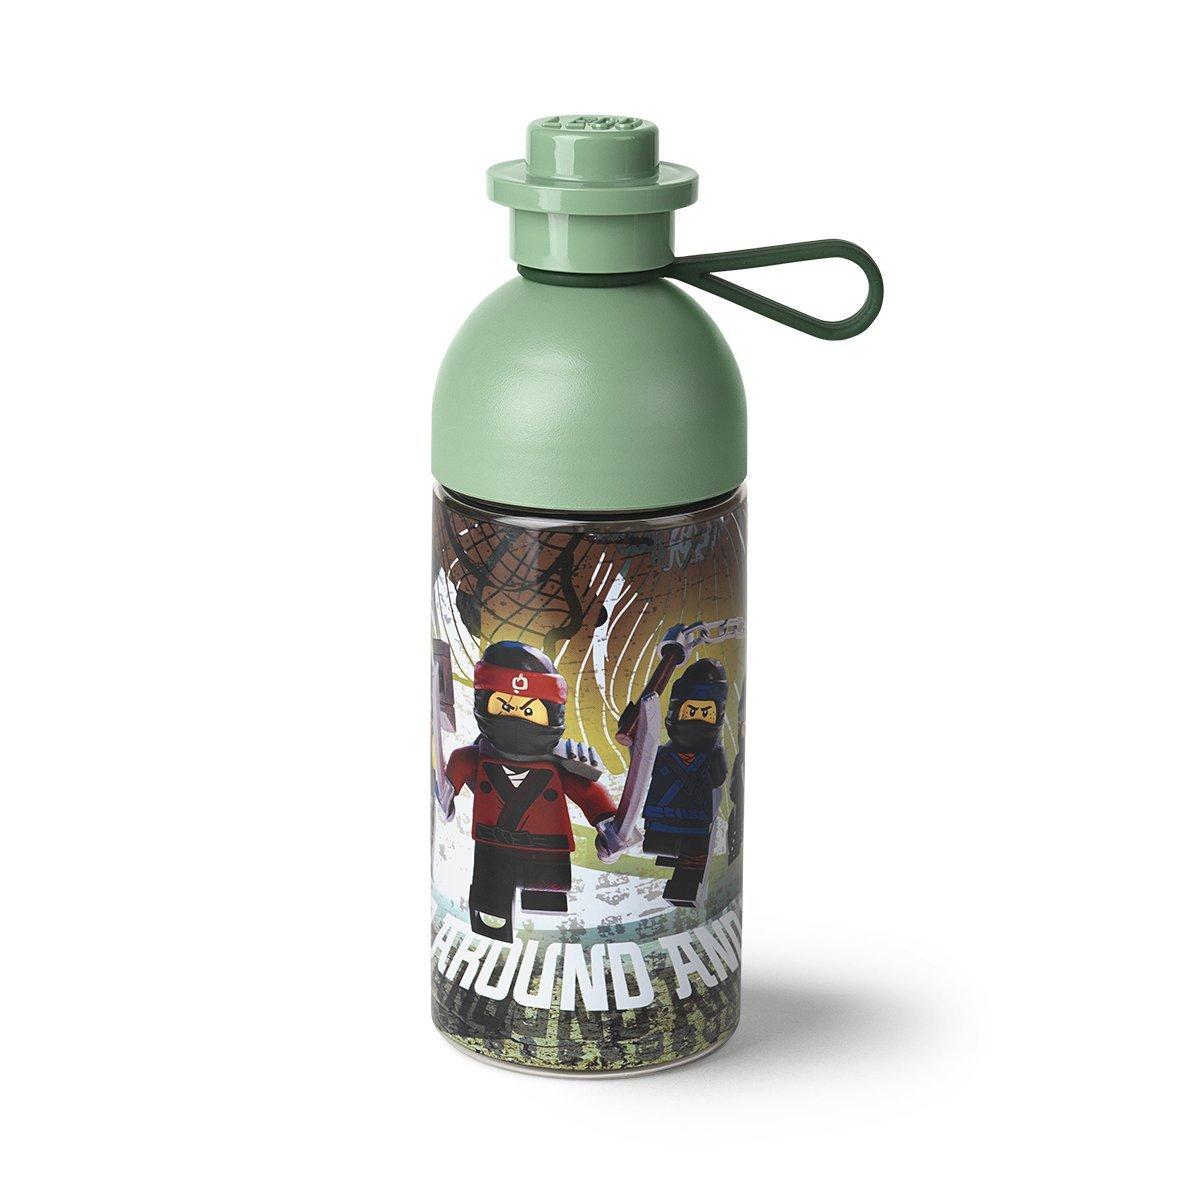 LEGO 40421741 Water Bottle Ninjago Movie Hydration, Olive Green